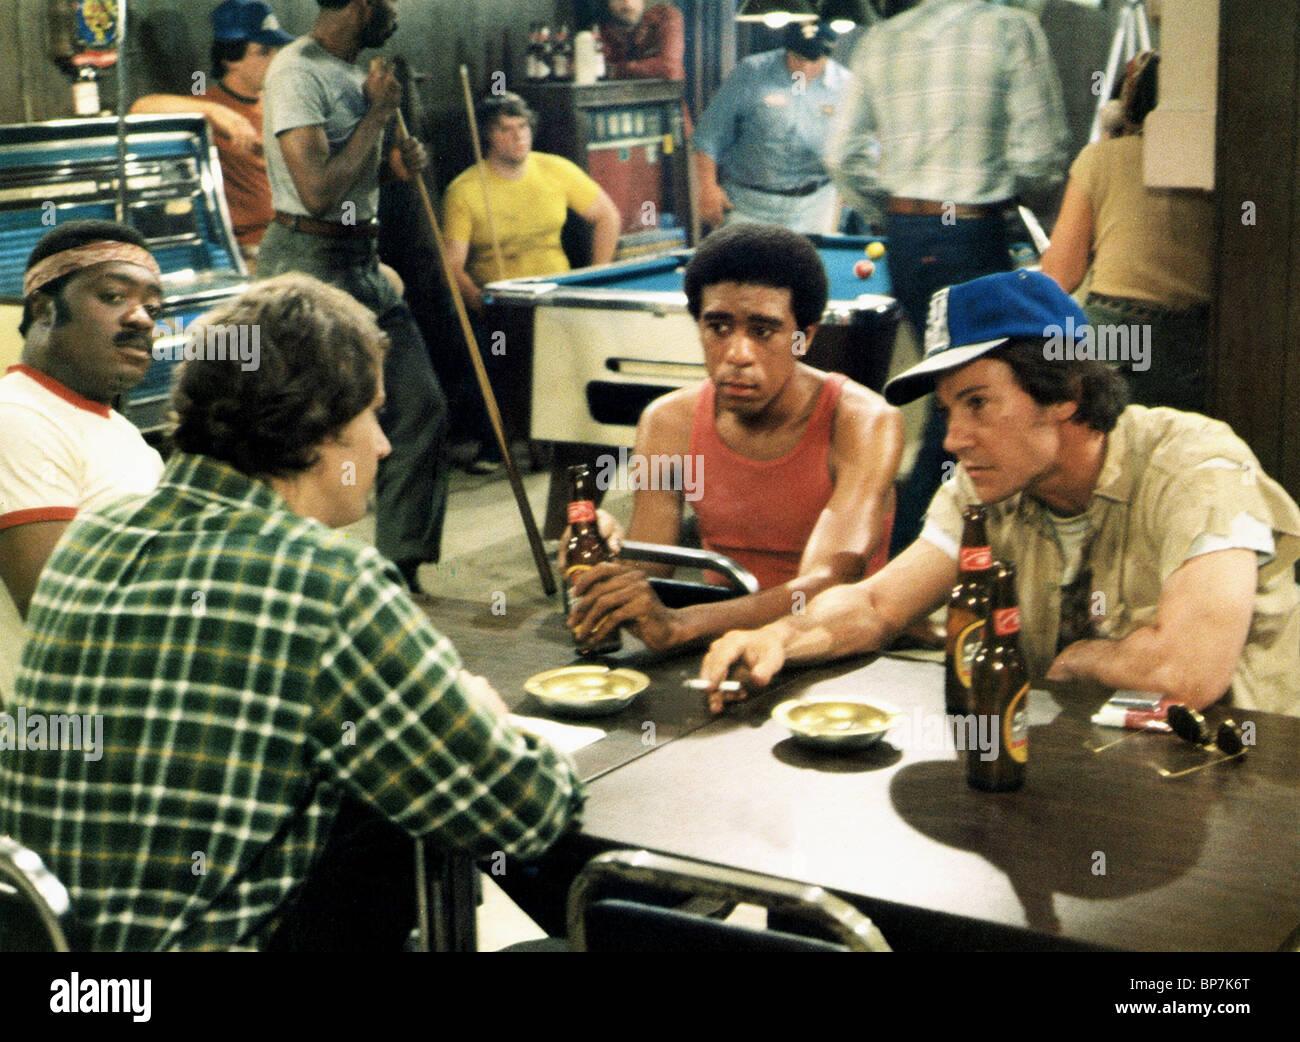 RICHARD PRYOR, Harvey Keitel, collare blu, 1980 Immagini Stock